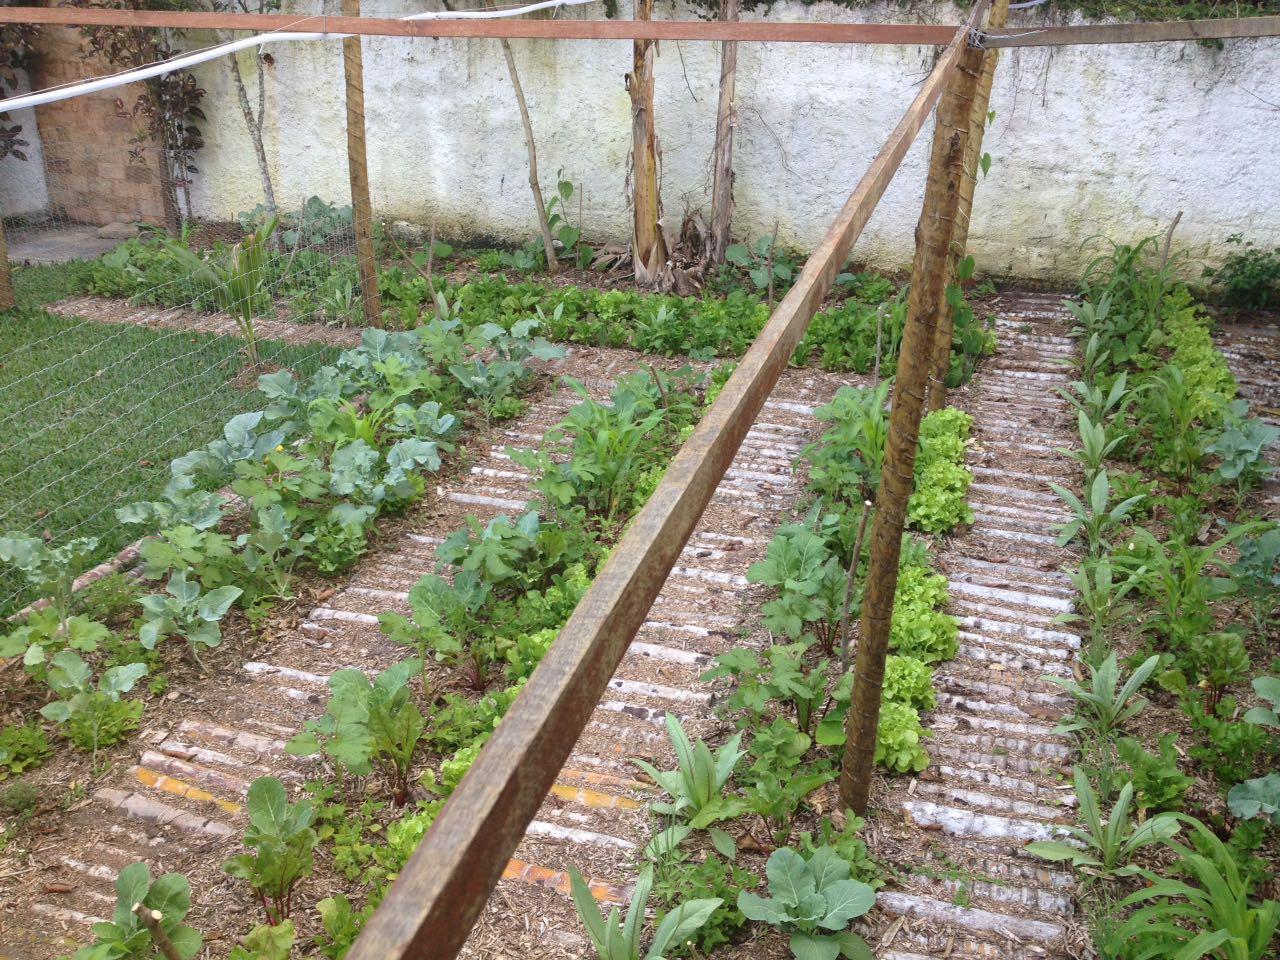 Estágio inicial de horta em quintal